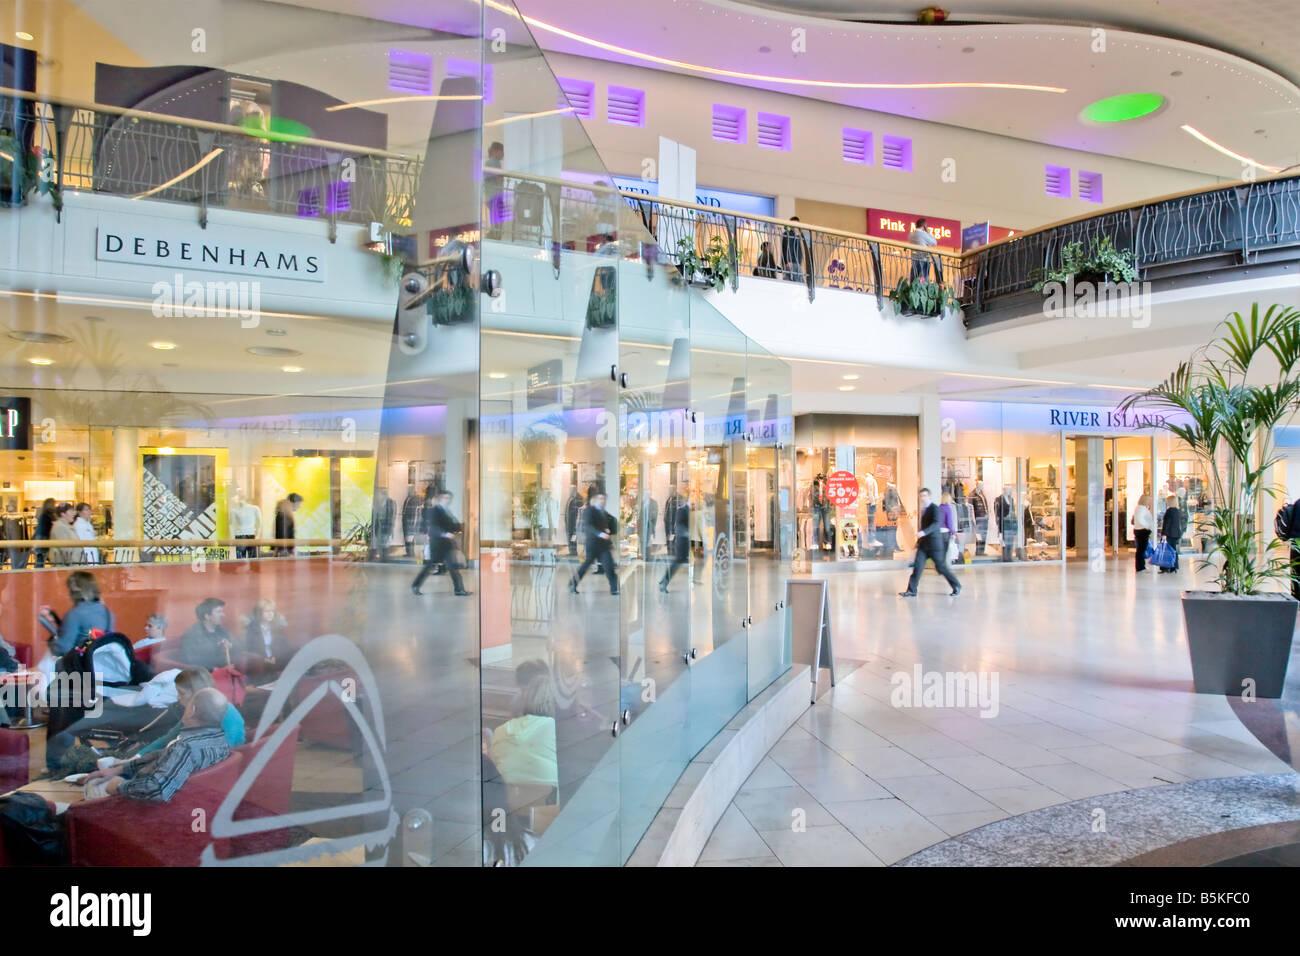 Overgate shopping centre Dundee Scotland - Stock Image